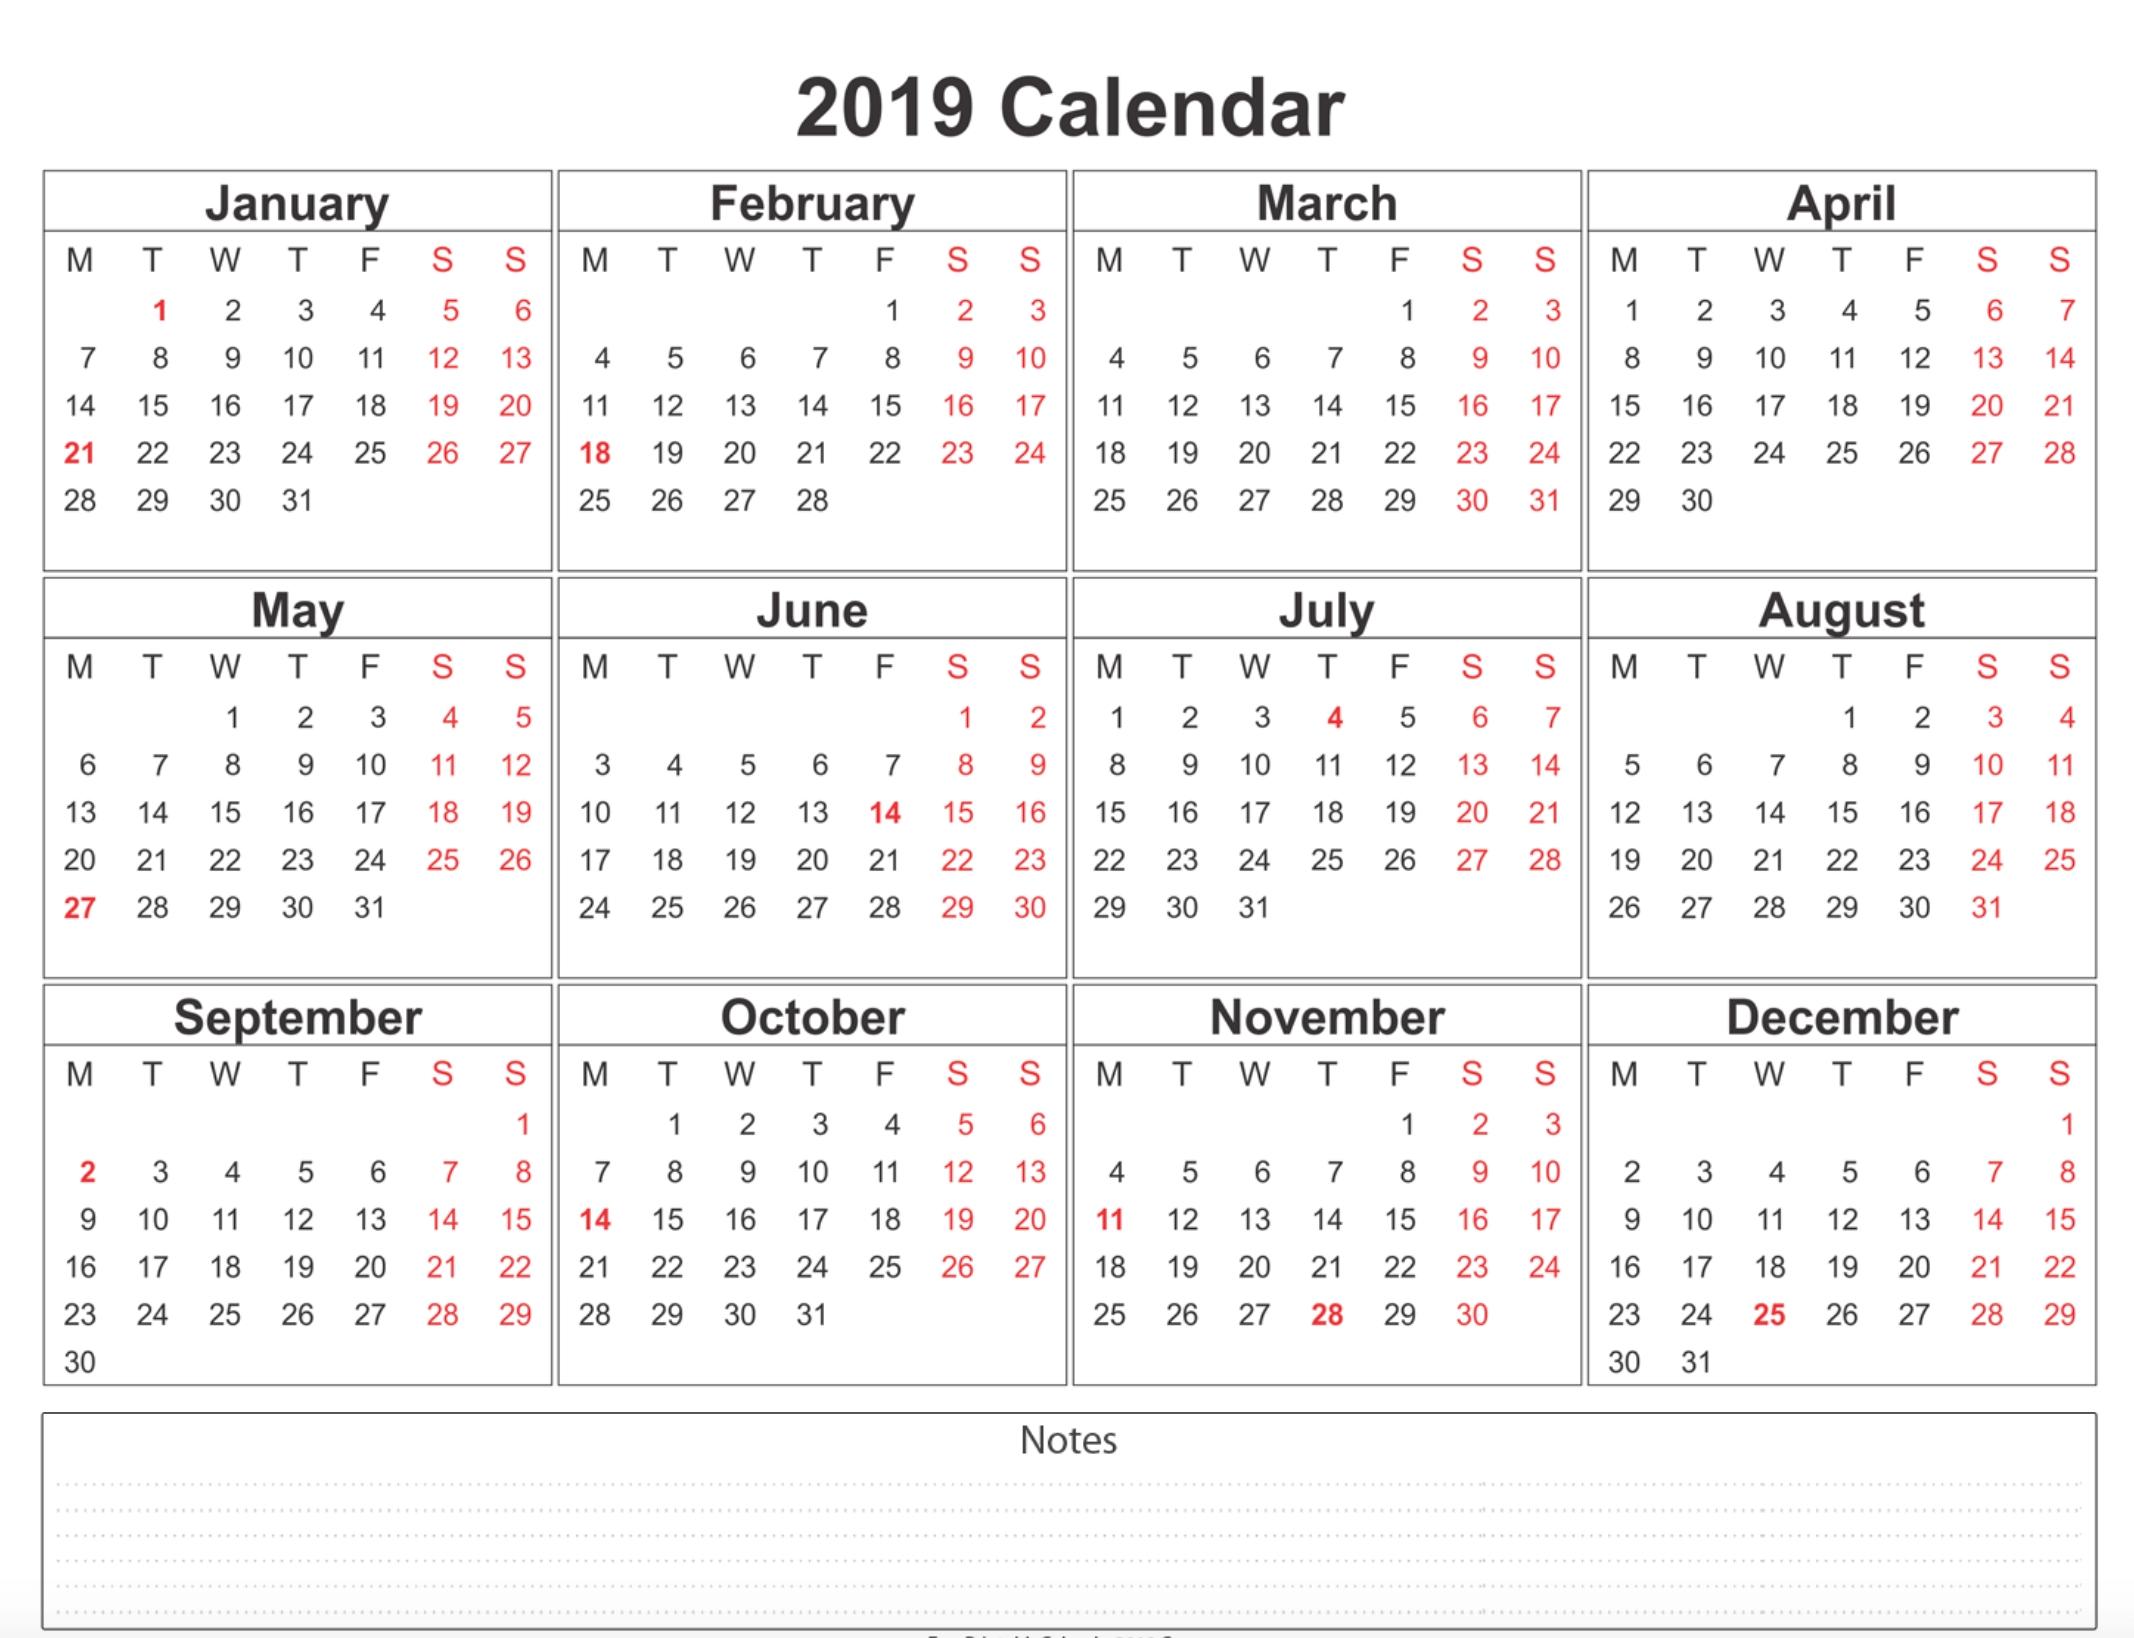 Free Printable Calendar 2019 With Holidays | Blank 12 Month Calendar Calendar 2019 Printable Free